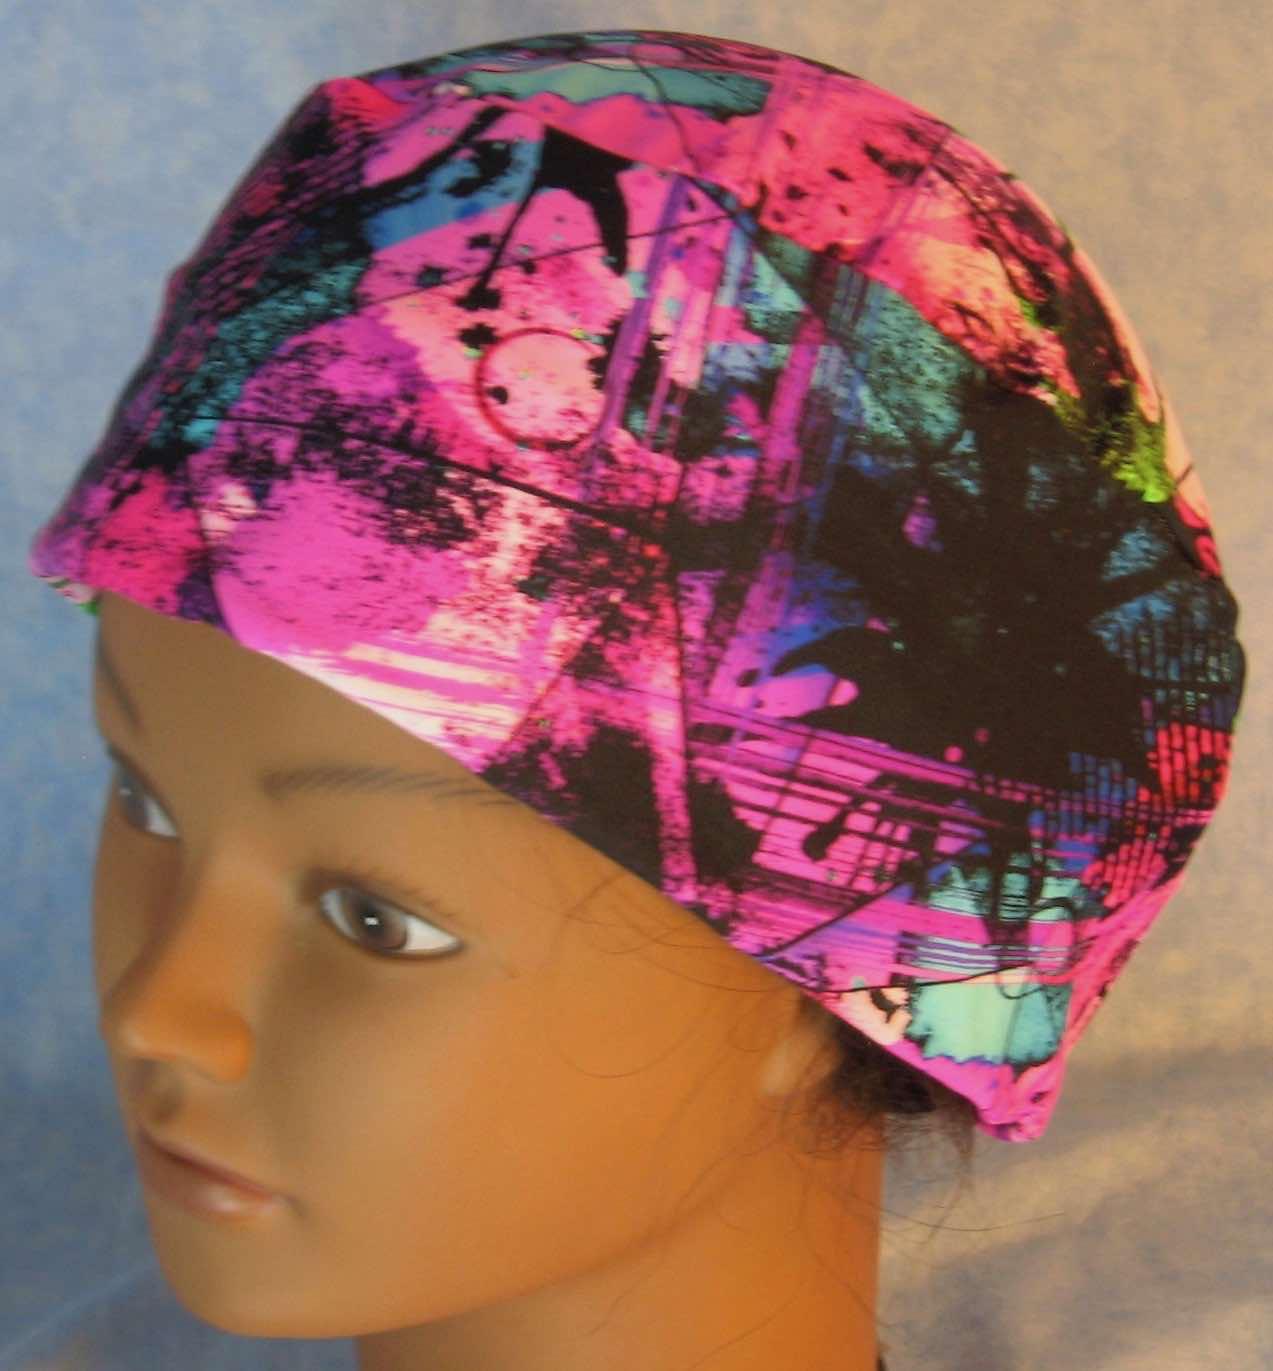 Skull Cap-Purple Pink Triangles with Black Green Blue Splatters Performance Knit-Adult XL